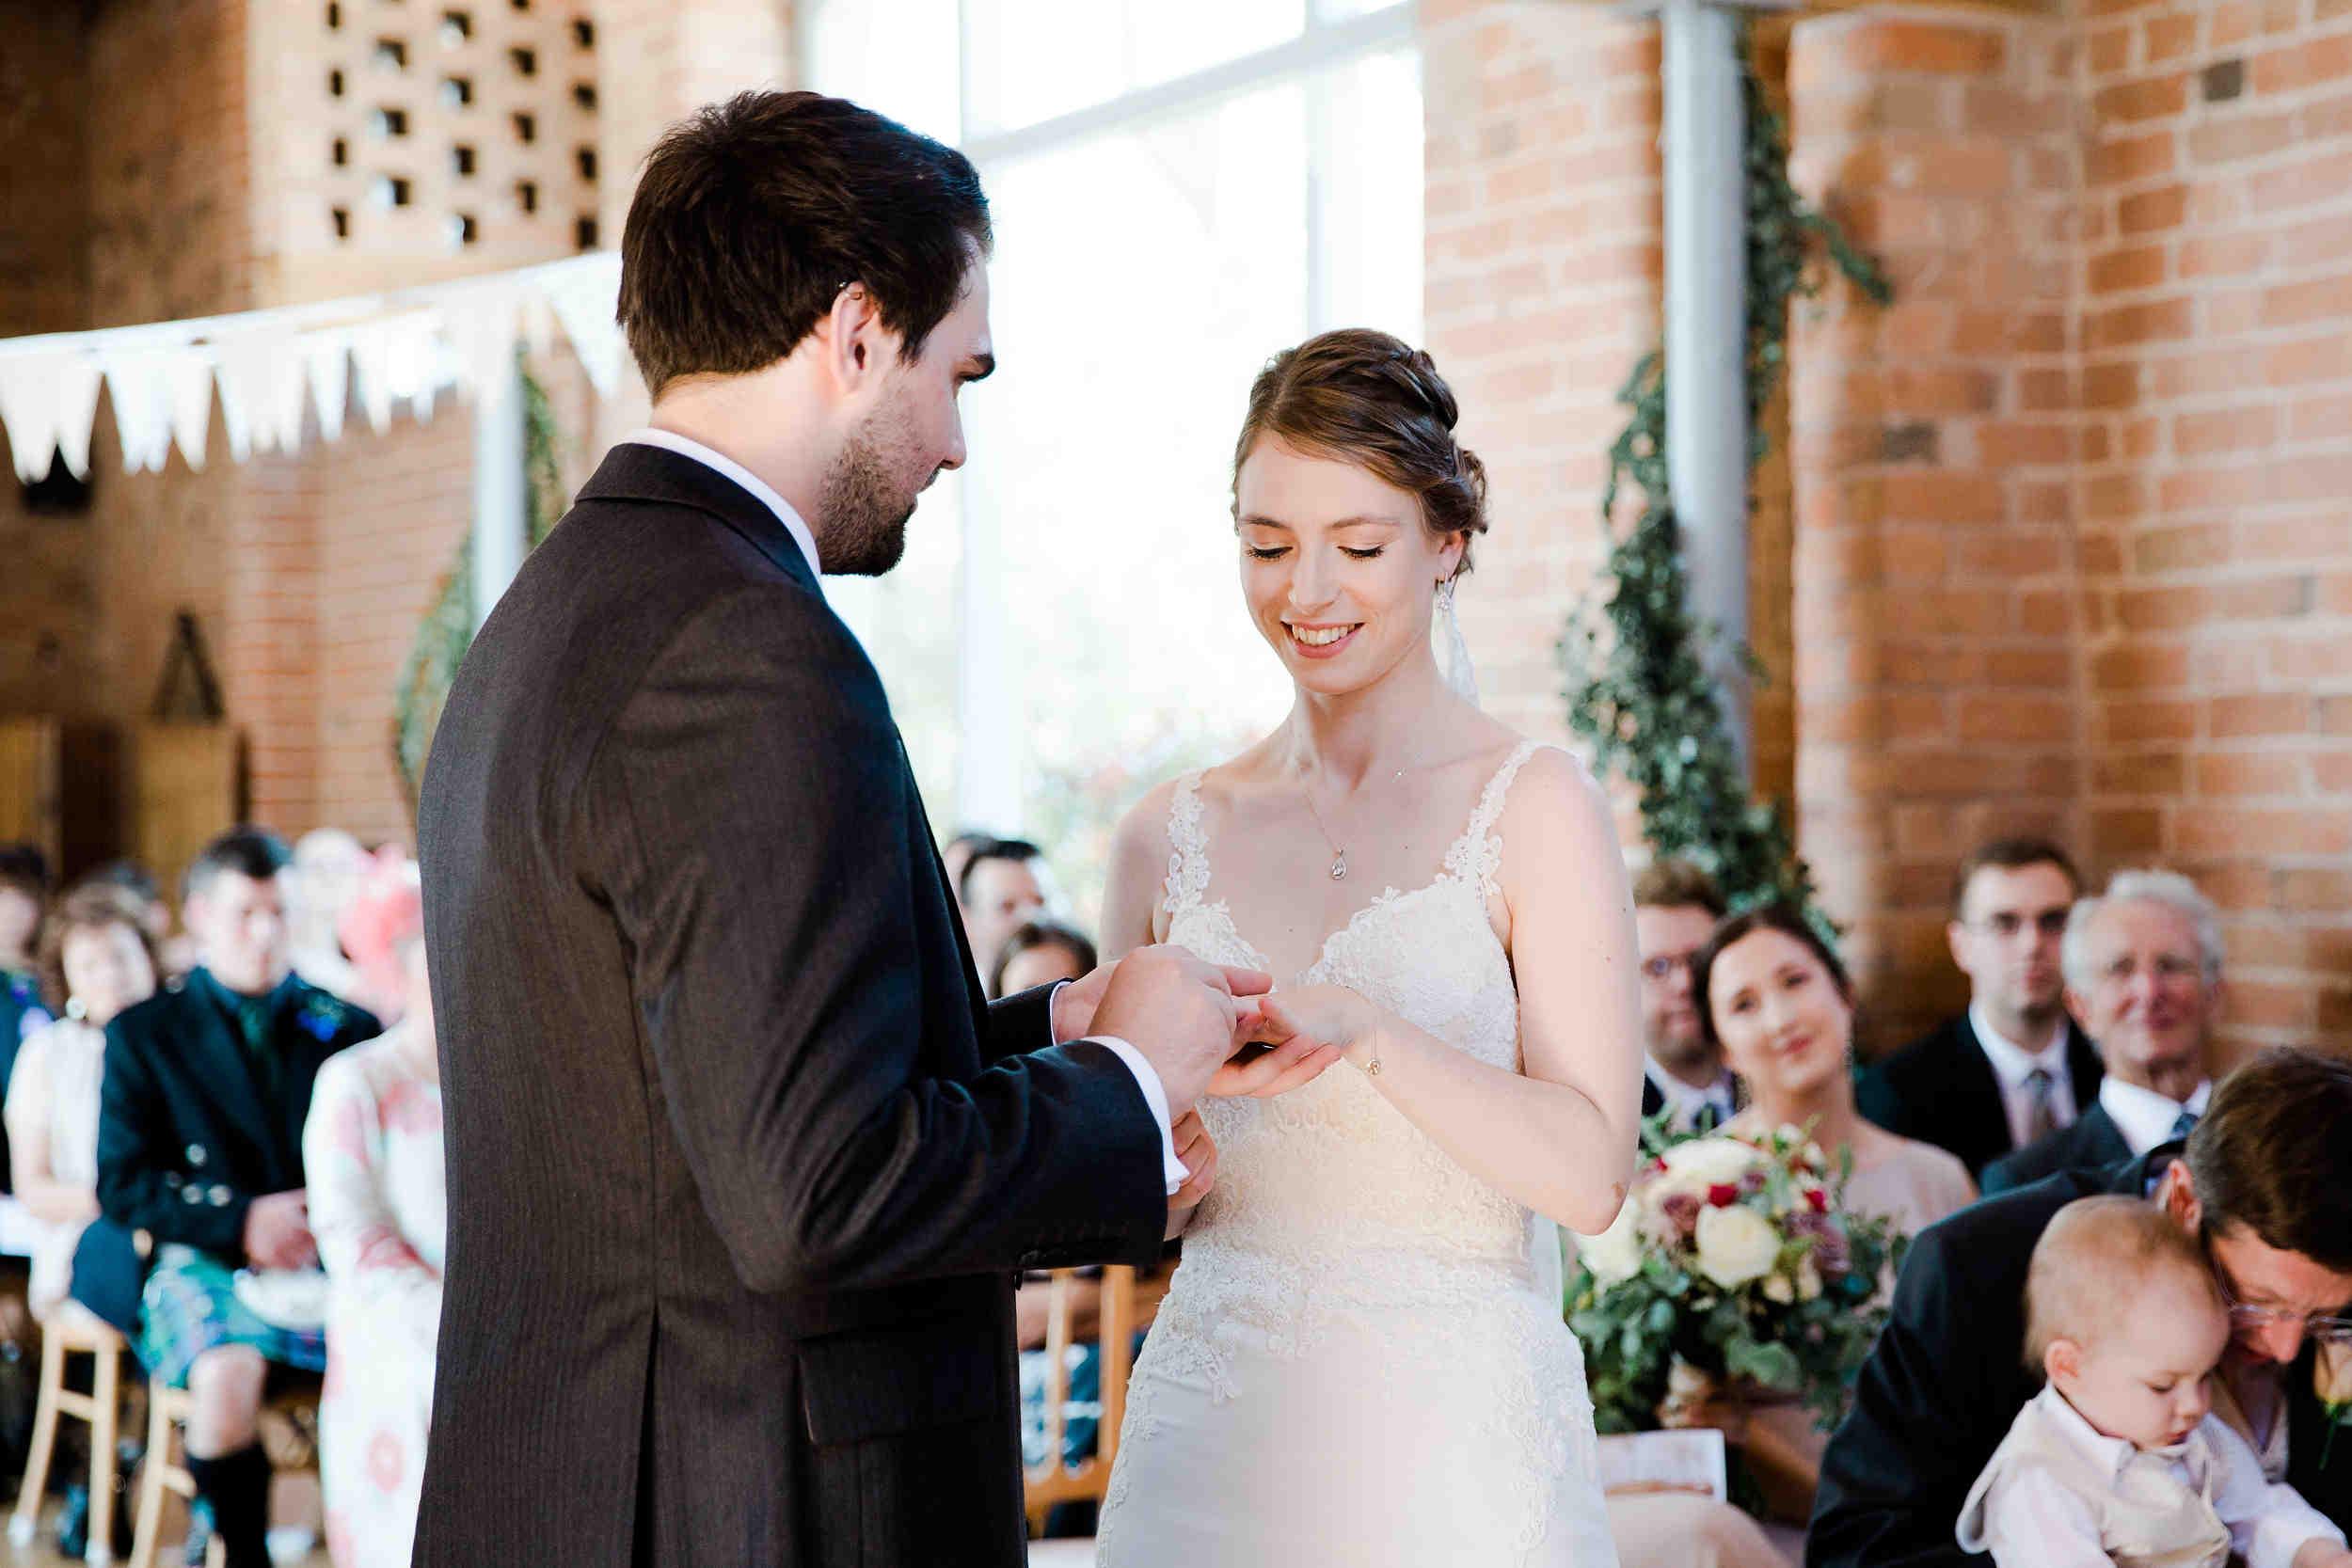 Modern_Stylish_Wedding_at_Swallows_Nest_Barn1181